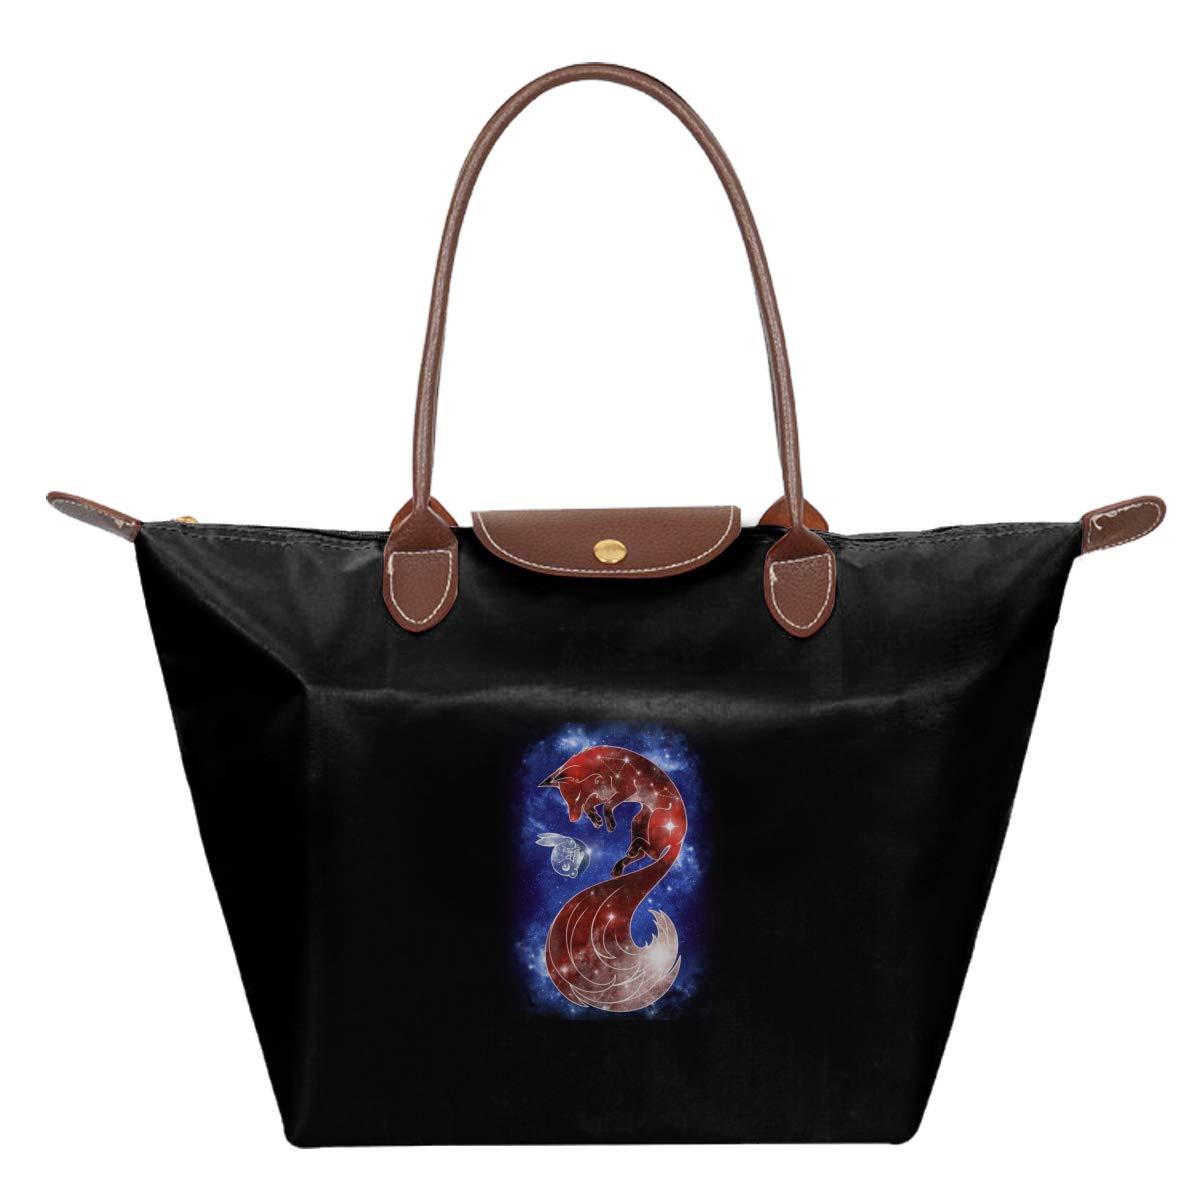 Starry Sleeping Moon Waterproof Leather Folded Messenger Nylon Bag Travel Tote Hopping Folding School Handbags